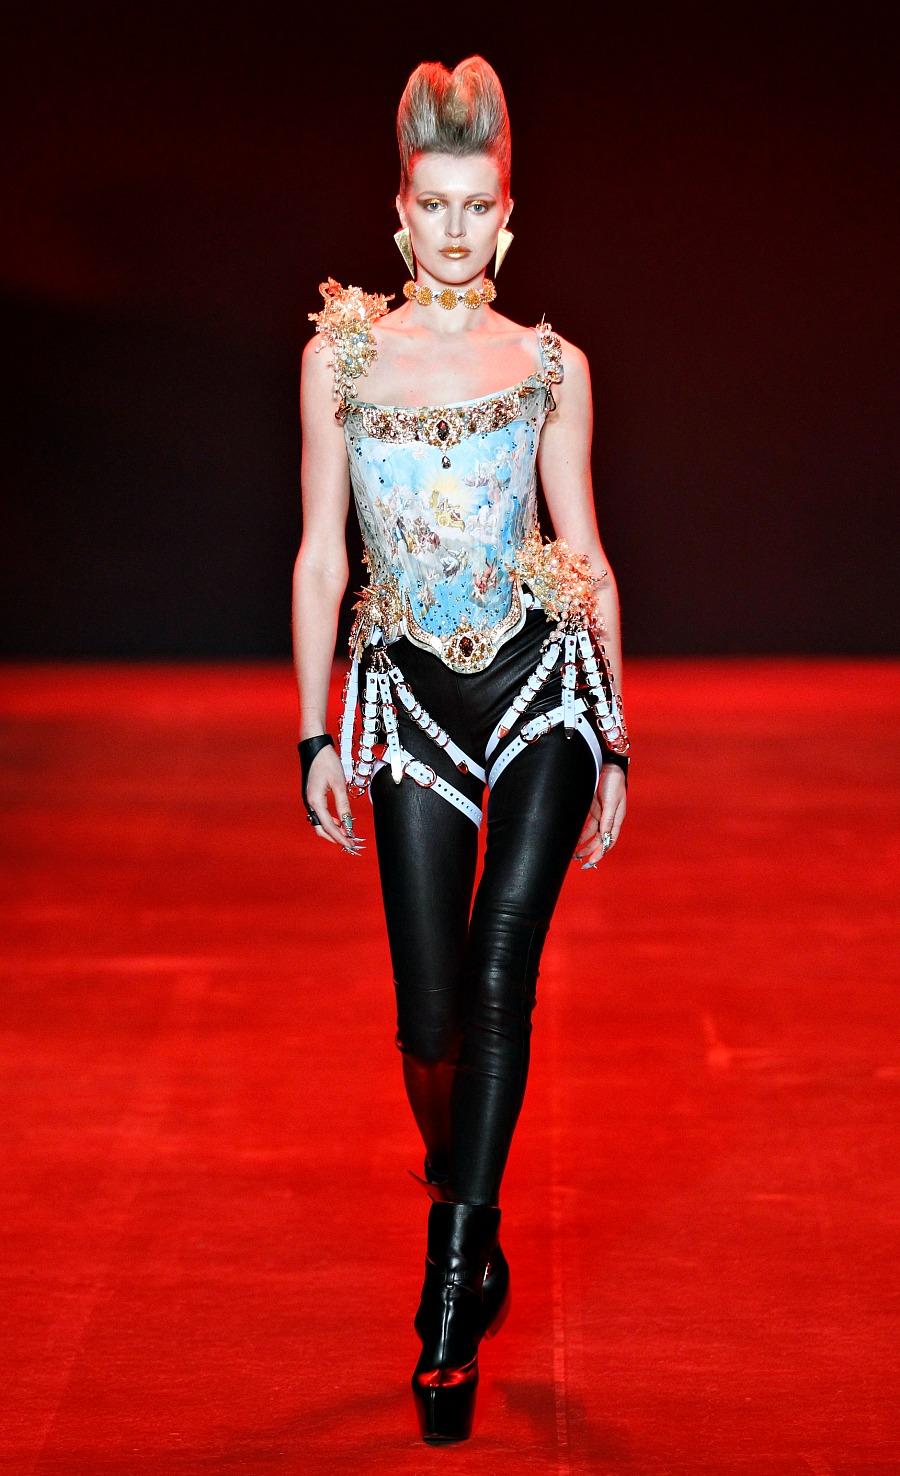 The Blonds Fall 2018 Runway at New York Fashion Week #NYFW #Runway